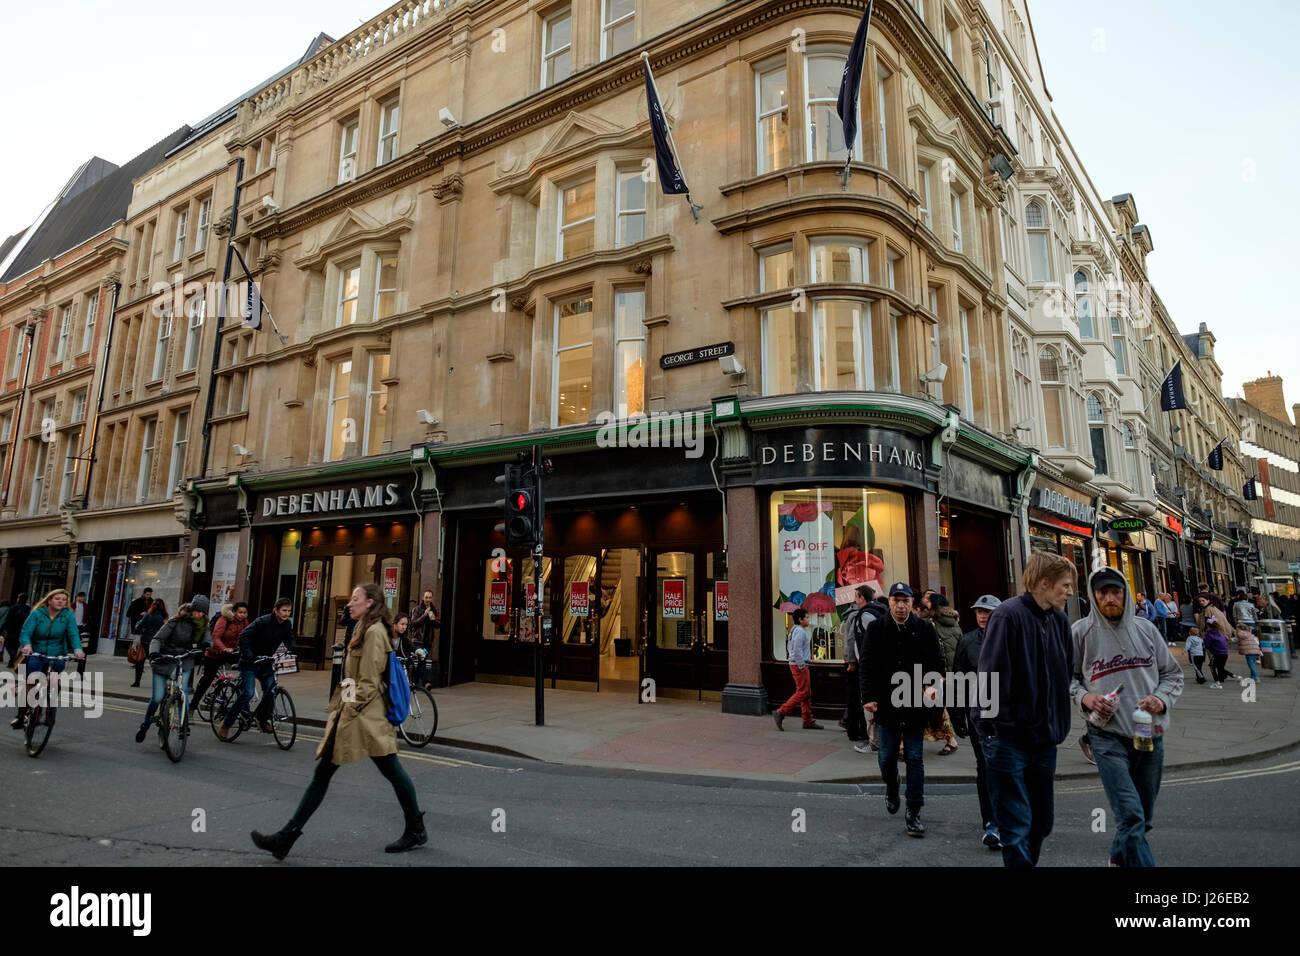 Debenhams store in Oxford, Oxfordshire, England, United Kingdom - Stock Image